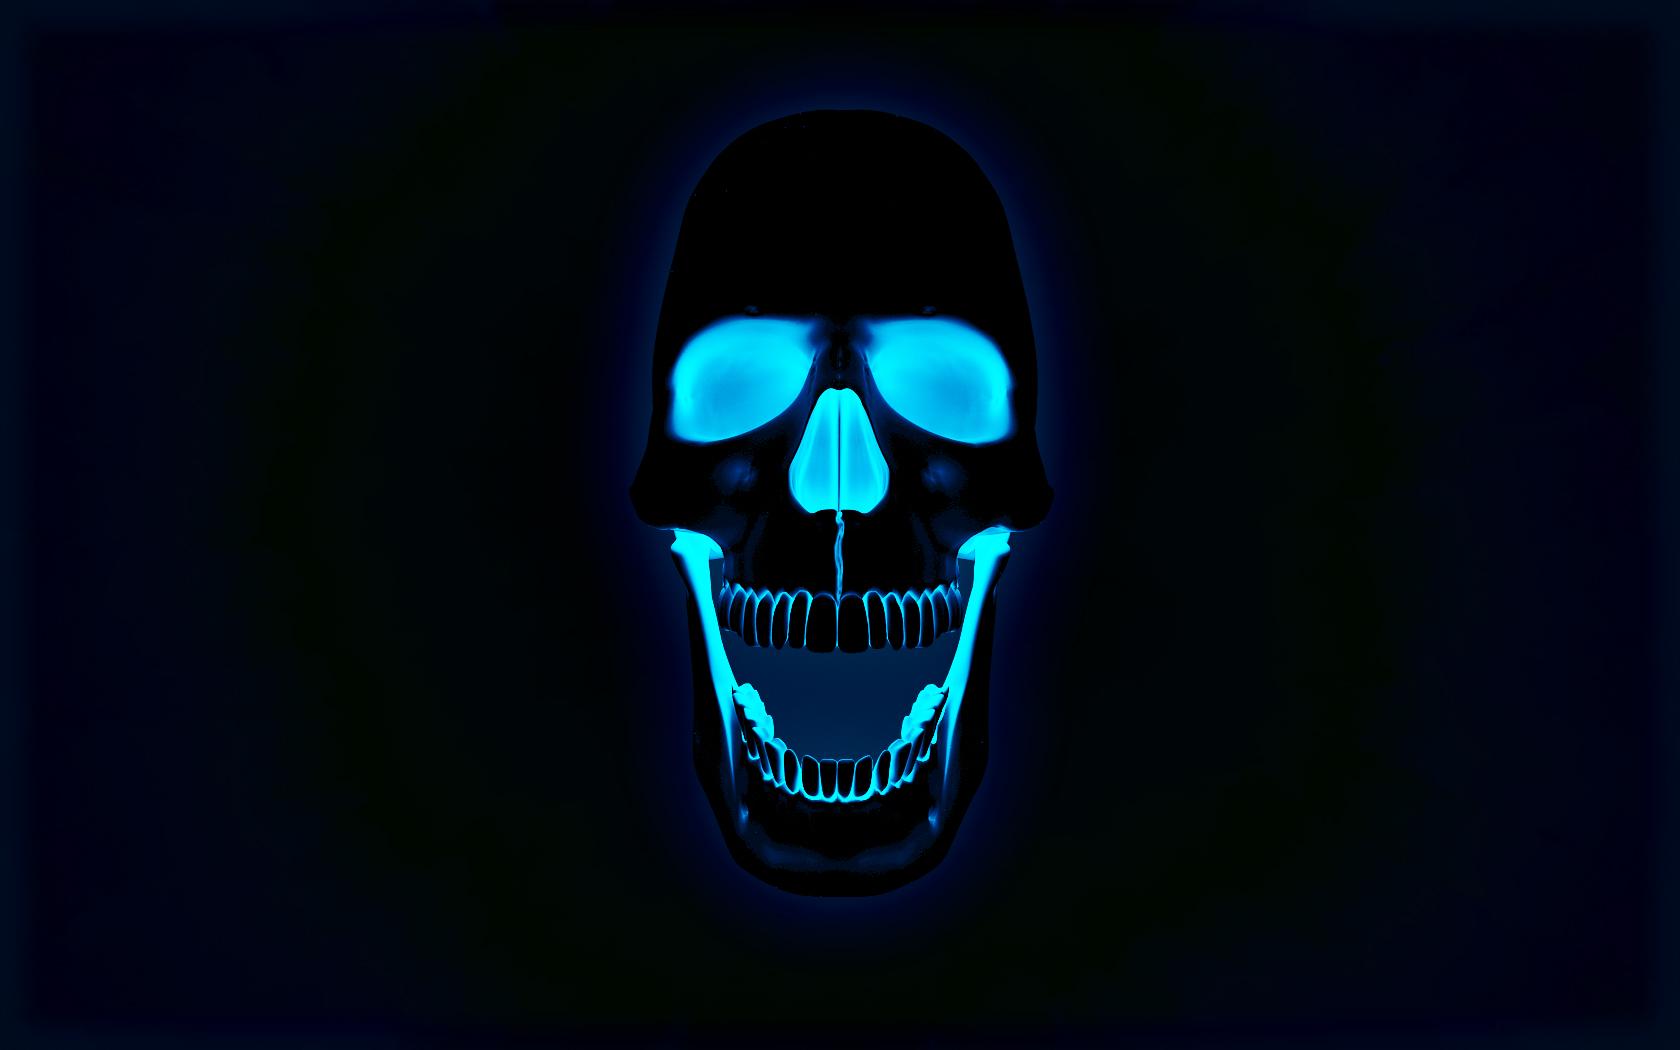 HD Skull Wallpapers 1080p 1680x1050